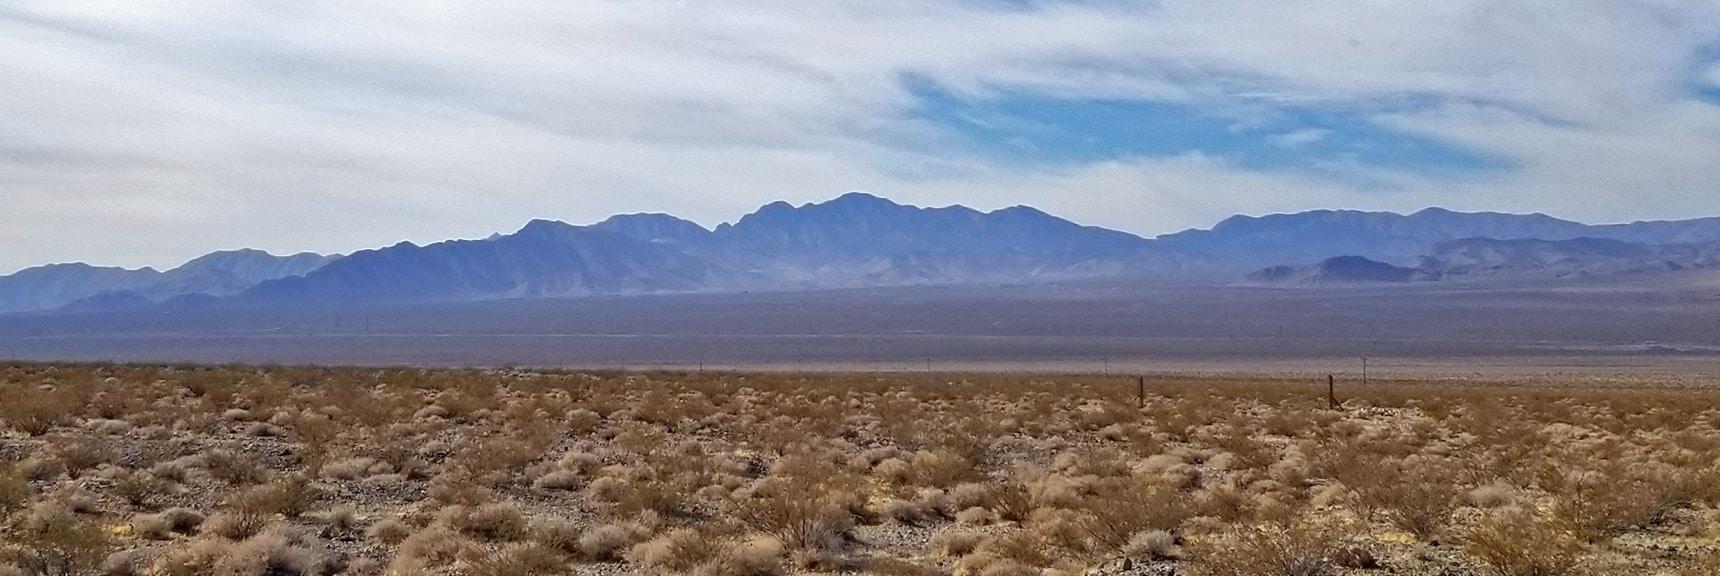 La Madre Mountains Wilderness | Smart Car Bike Rack and Mountain Bike Test, Sheep Range, Nevada